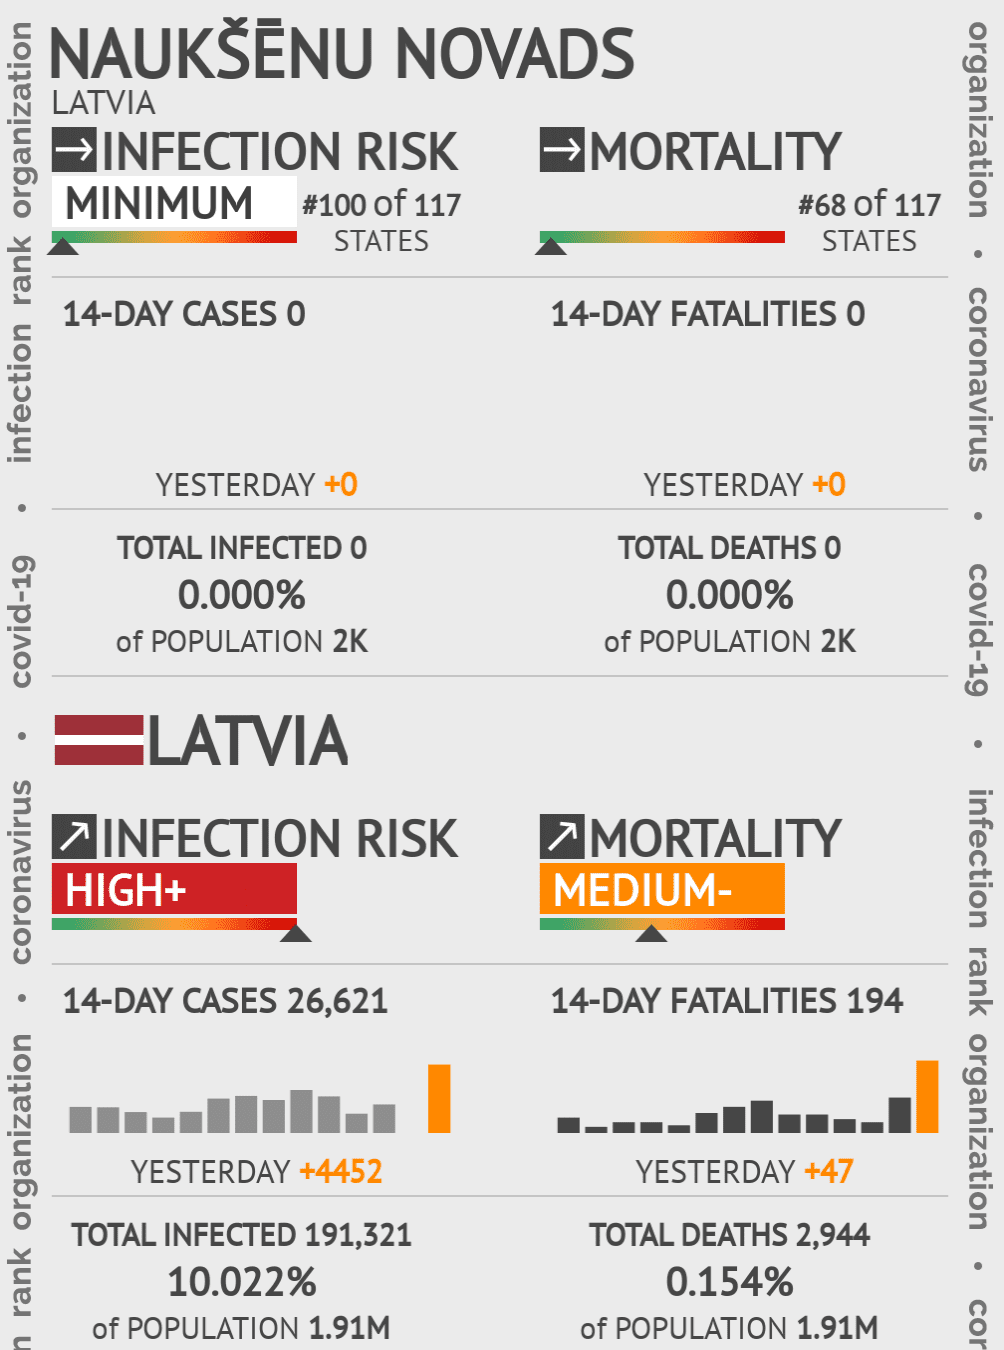 Naukšēnu novads Coronavirus Covid-19 Risk of Infection on May 06, 2020